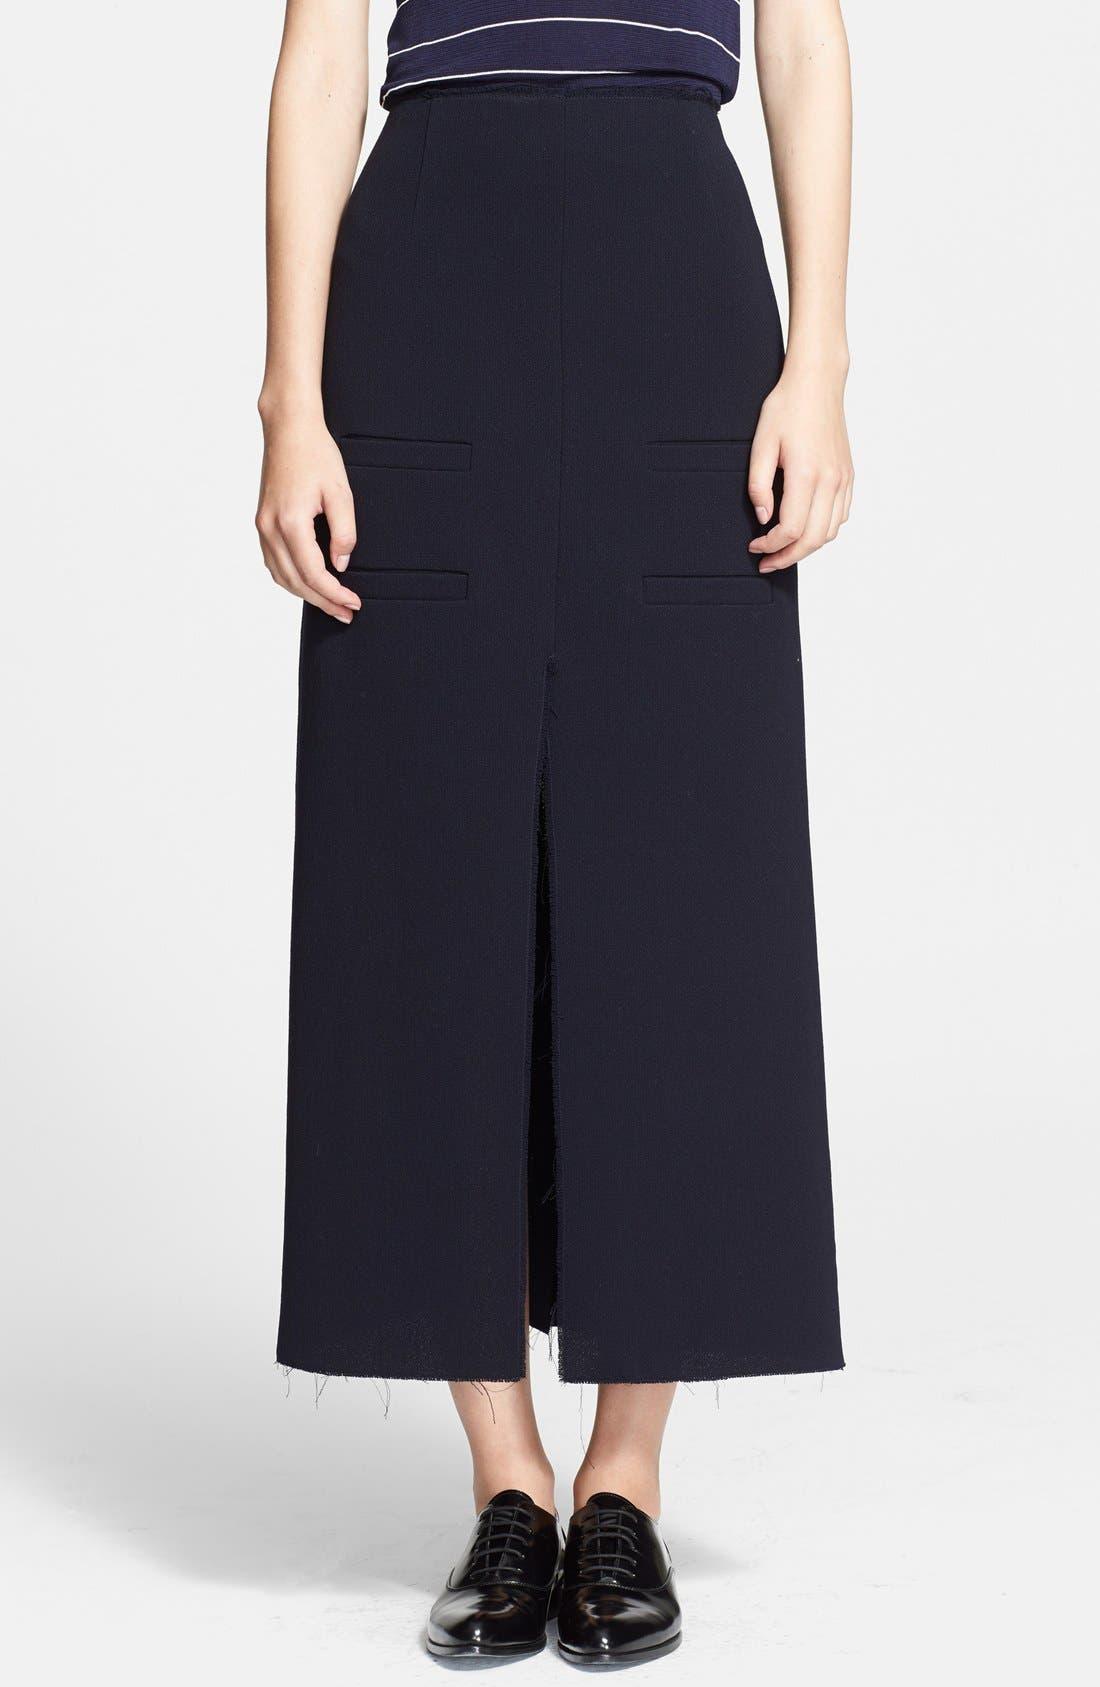 Alternate Image 1 Selected - J.W.ANDERSON Stretch Crepe Midi Skirt